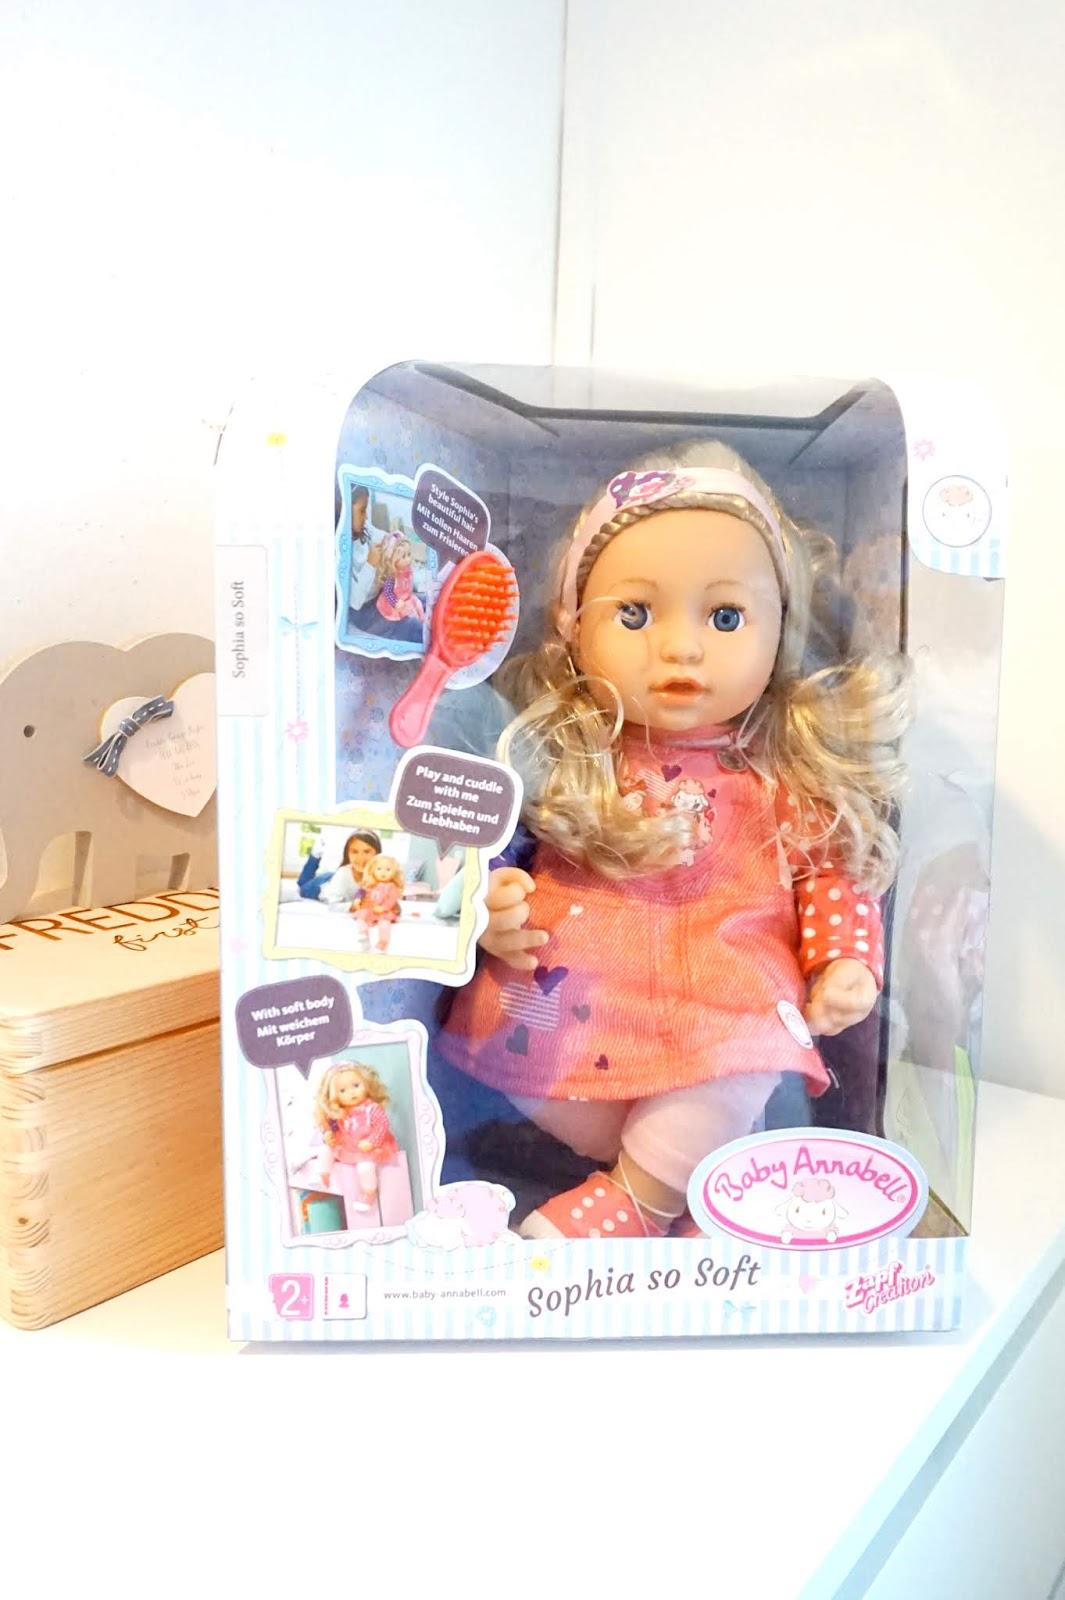 Baby Annabell Sophia So Soft Review — Beth Owen